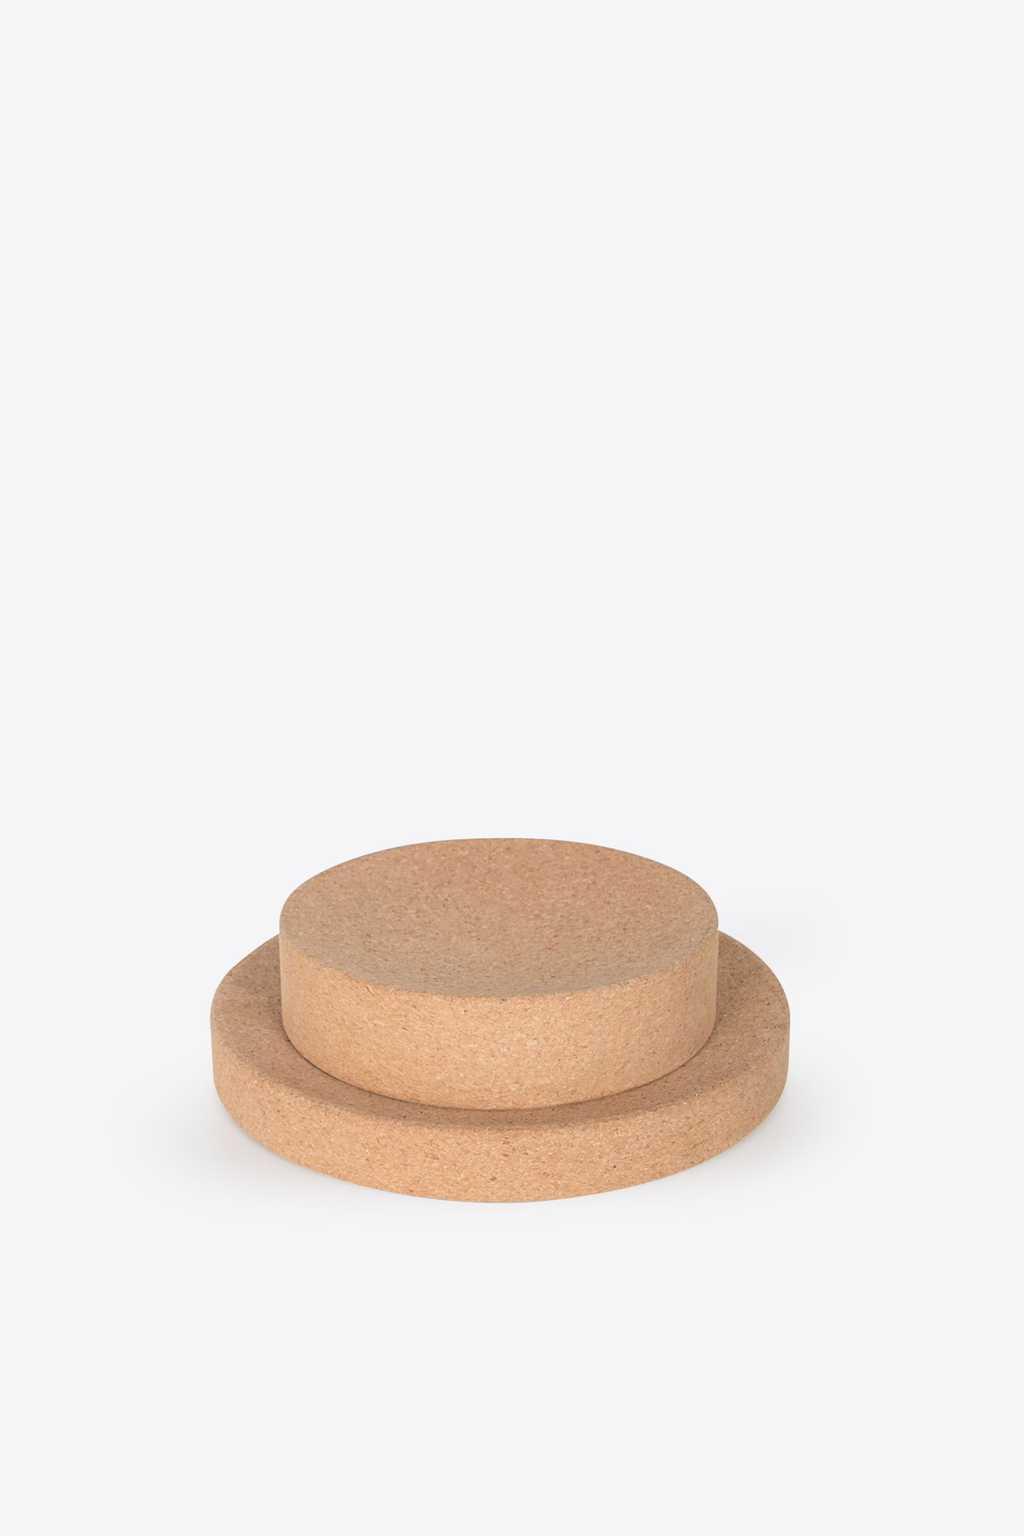 Small Cork Bowl 1037 Brown 3